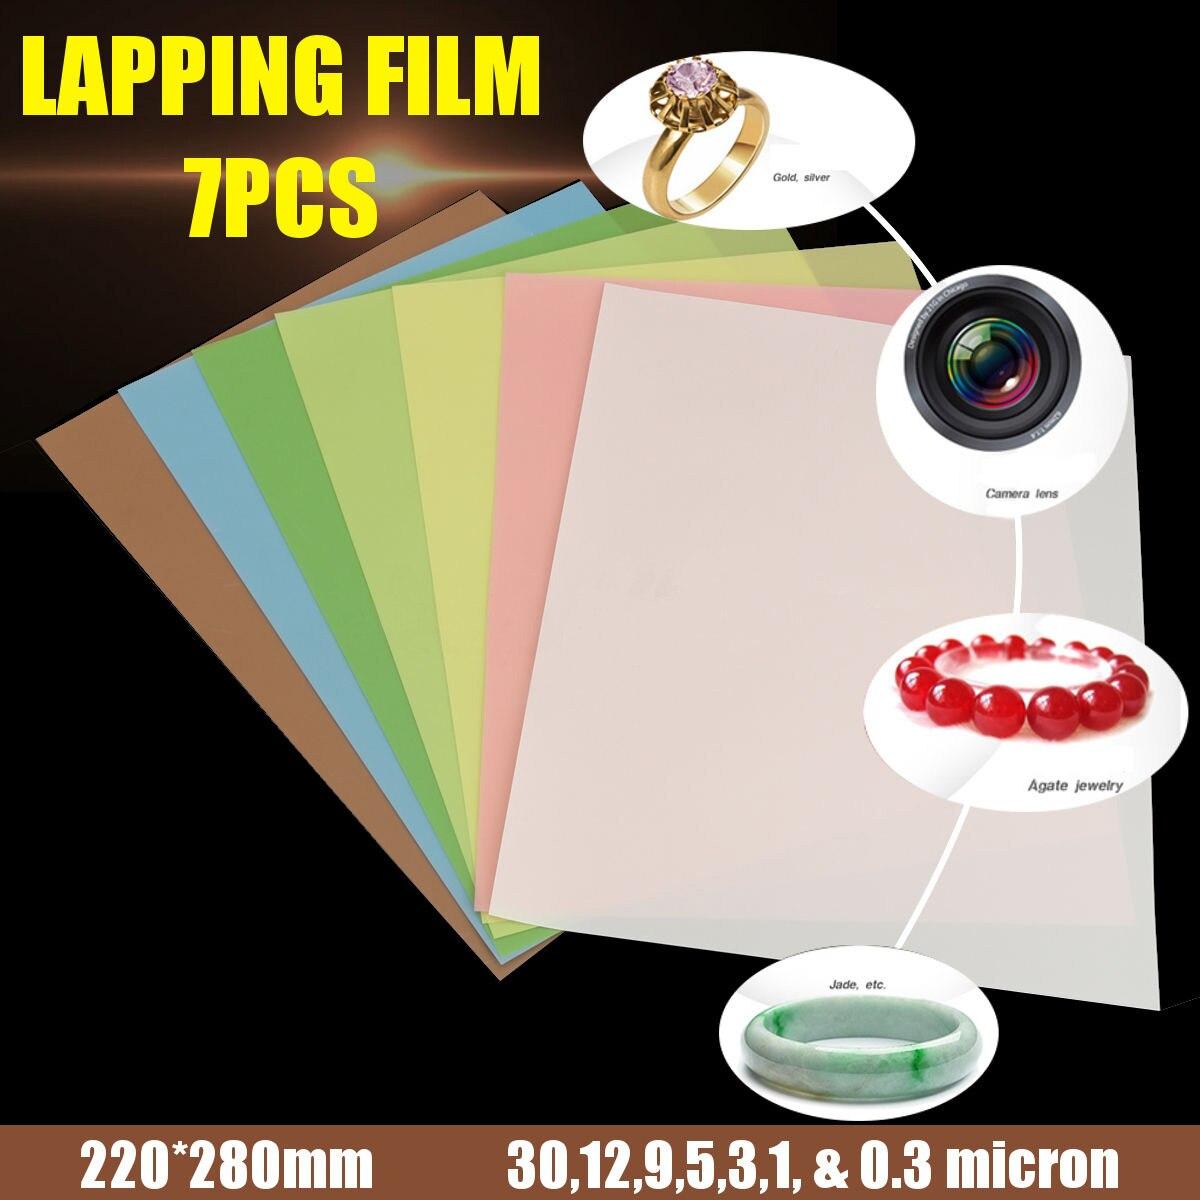 7pcs 8.7\\\\\\\'\\\\\\\' X 11\\\\\\\'\\\\\\\' Lapping Film Sheets Assortment 30,12,9,5,3,1,0.3 Accessories